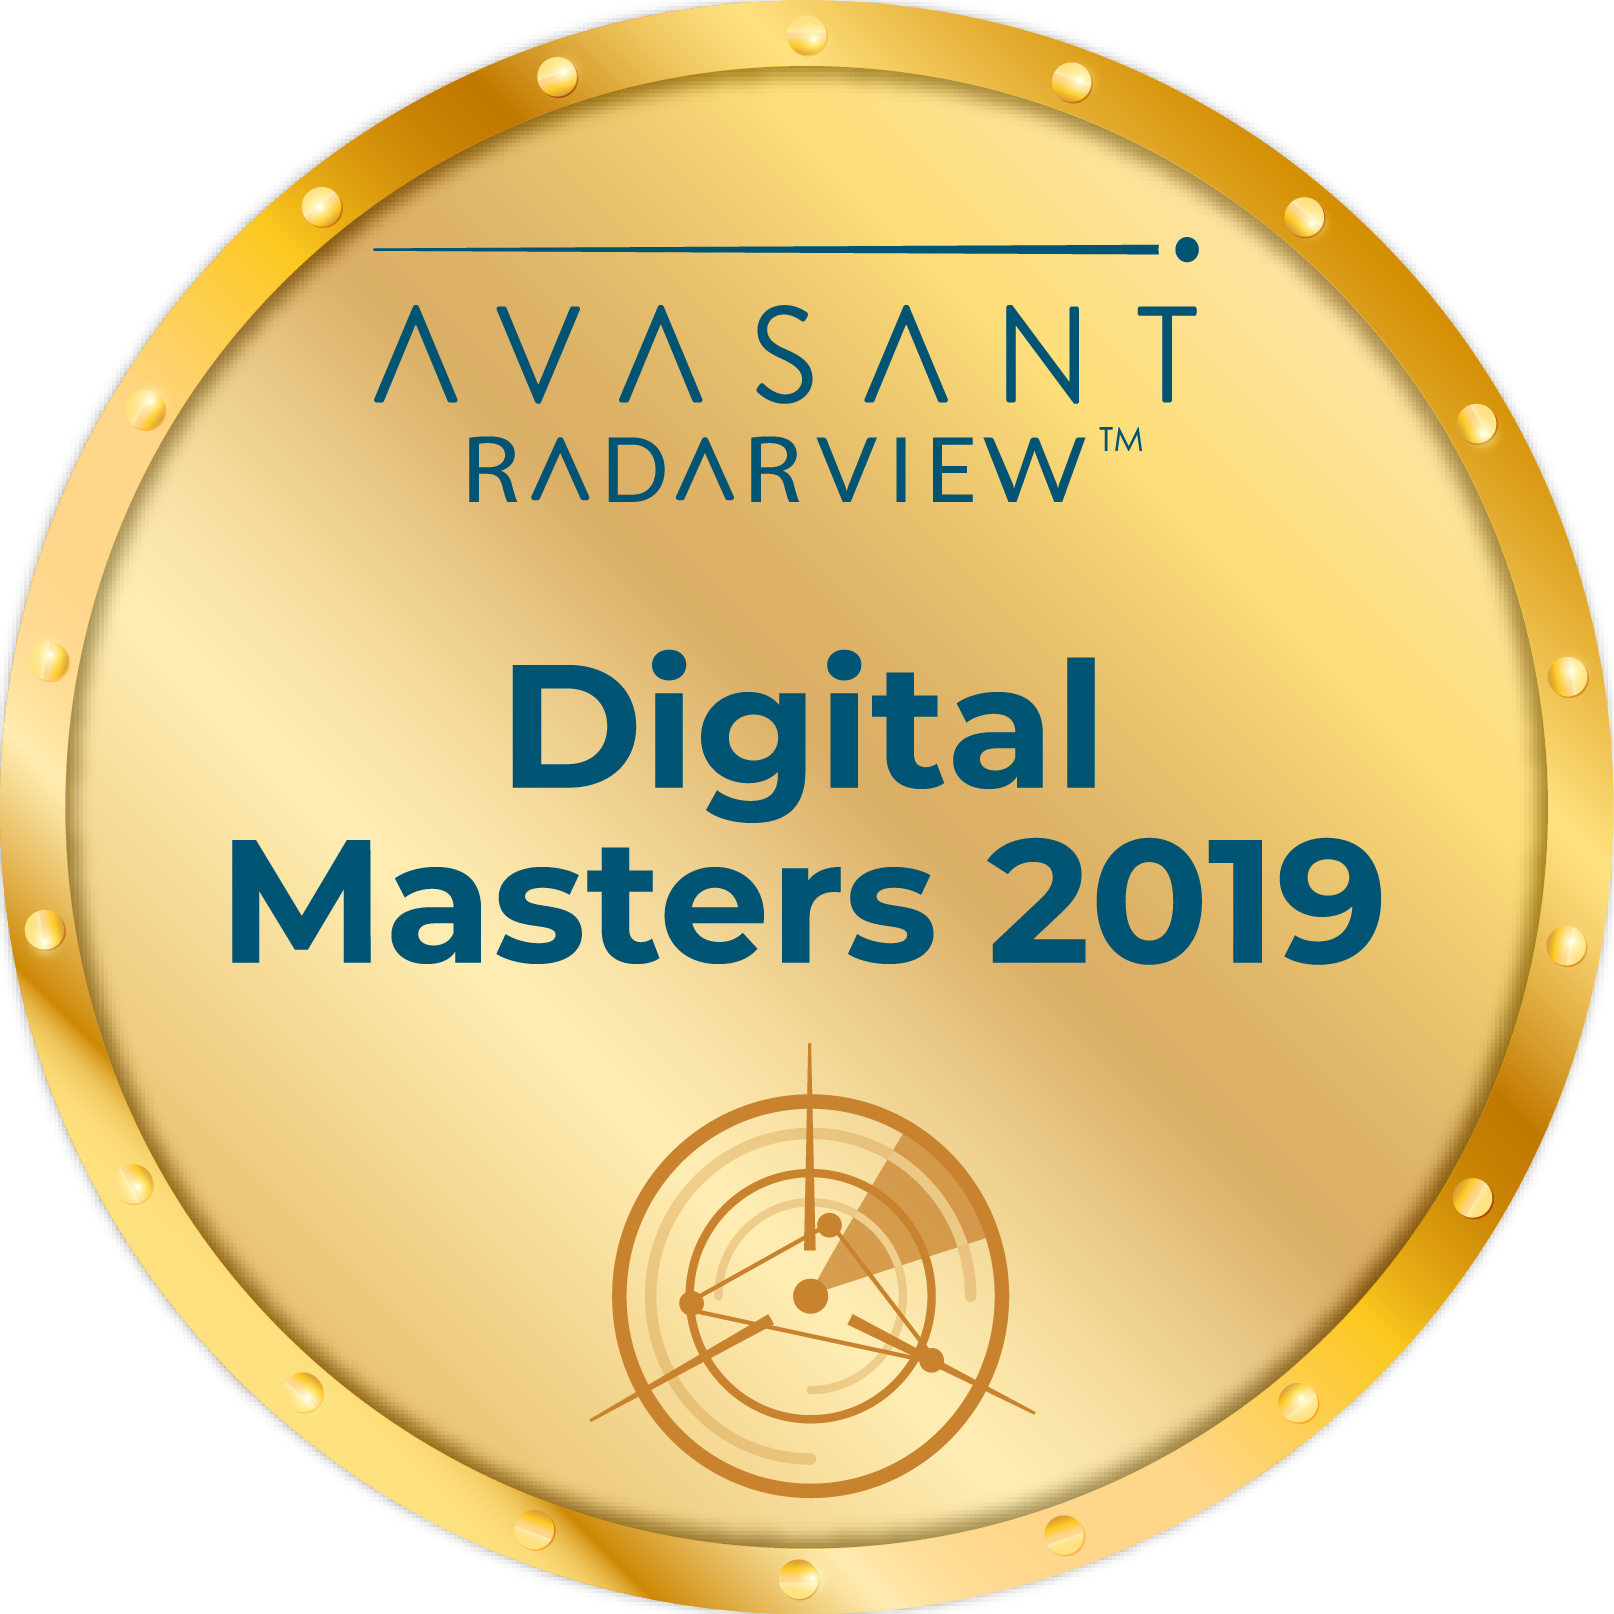 Round Badge Digital Masters 2019 - RadarView™